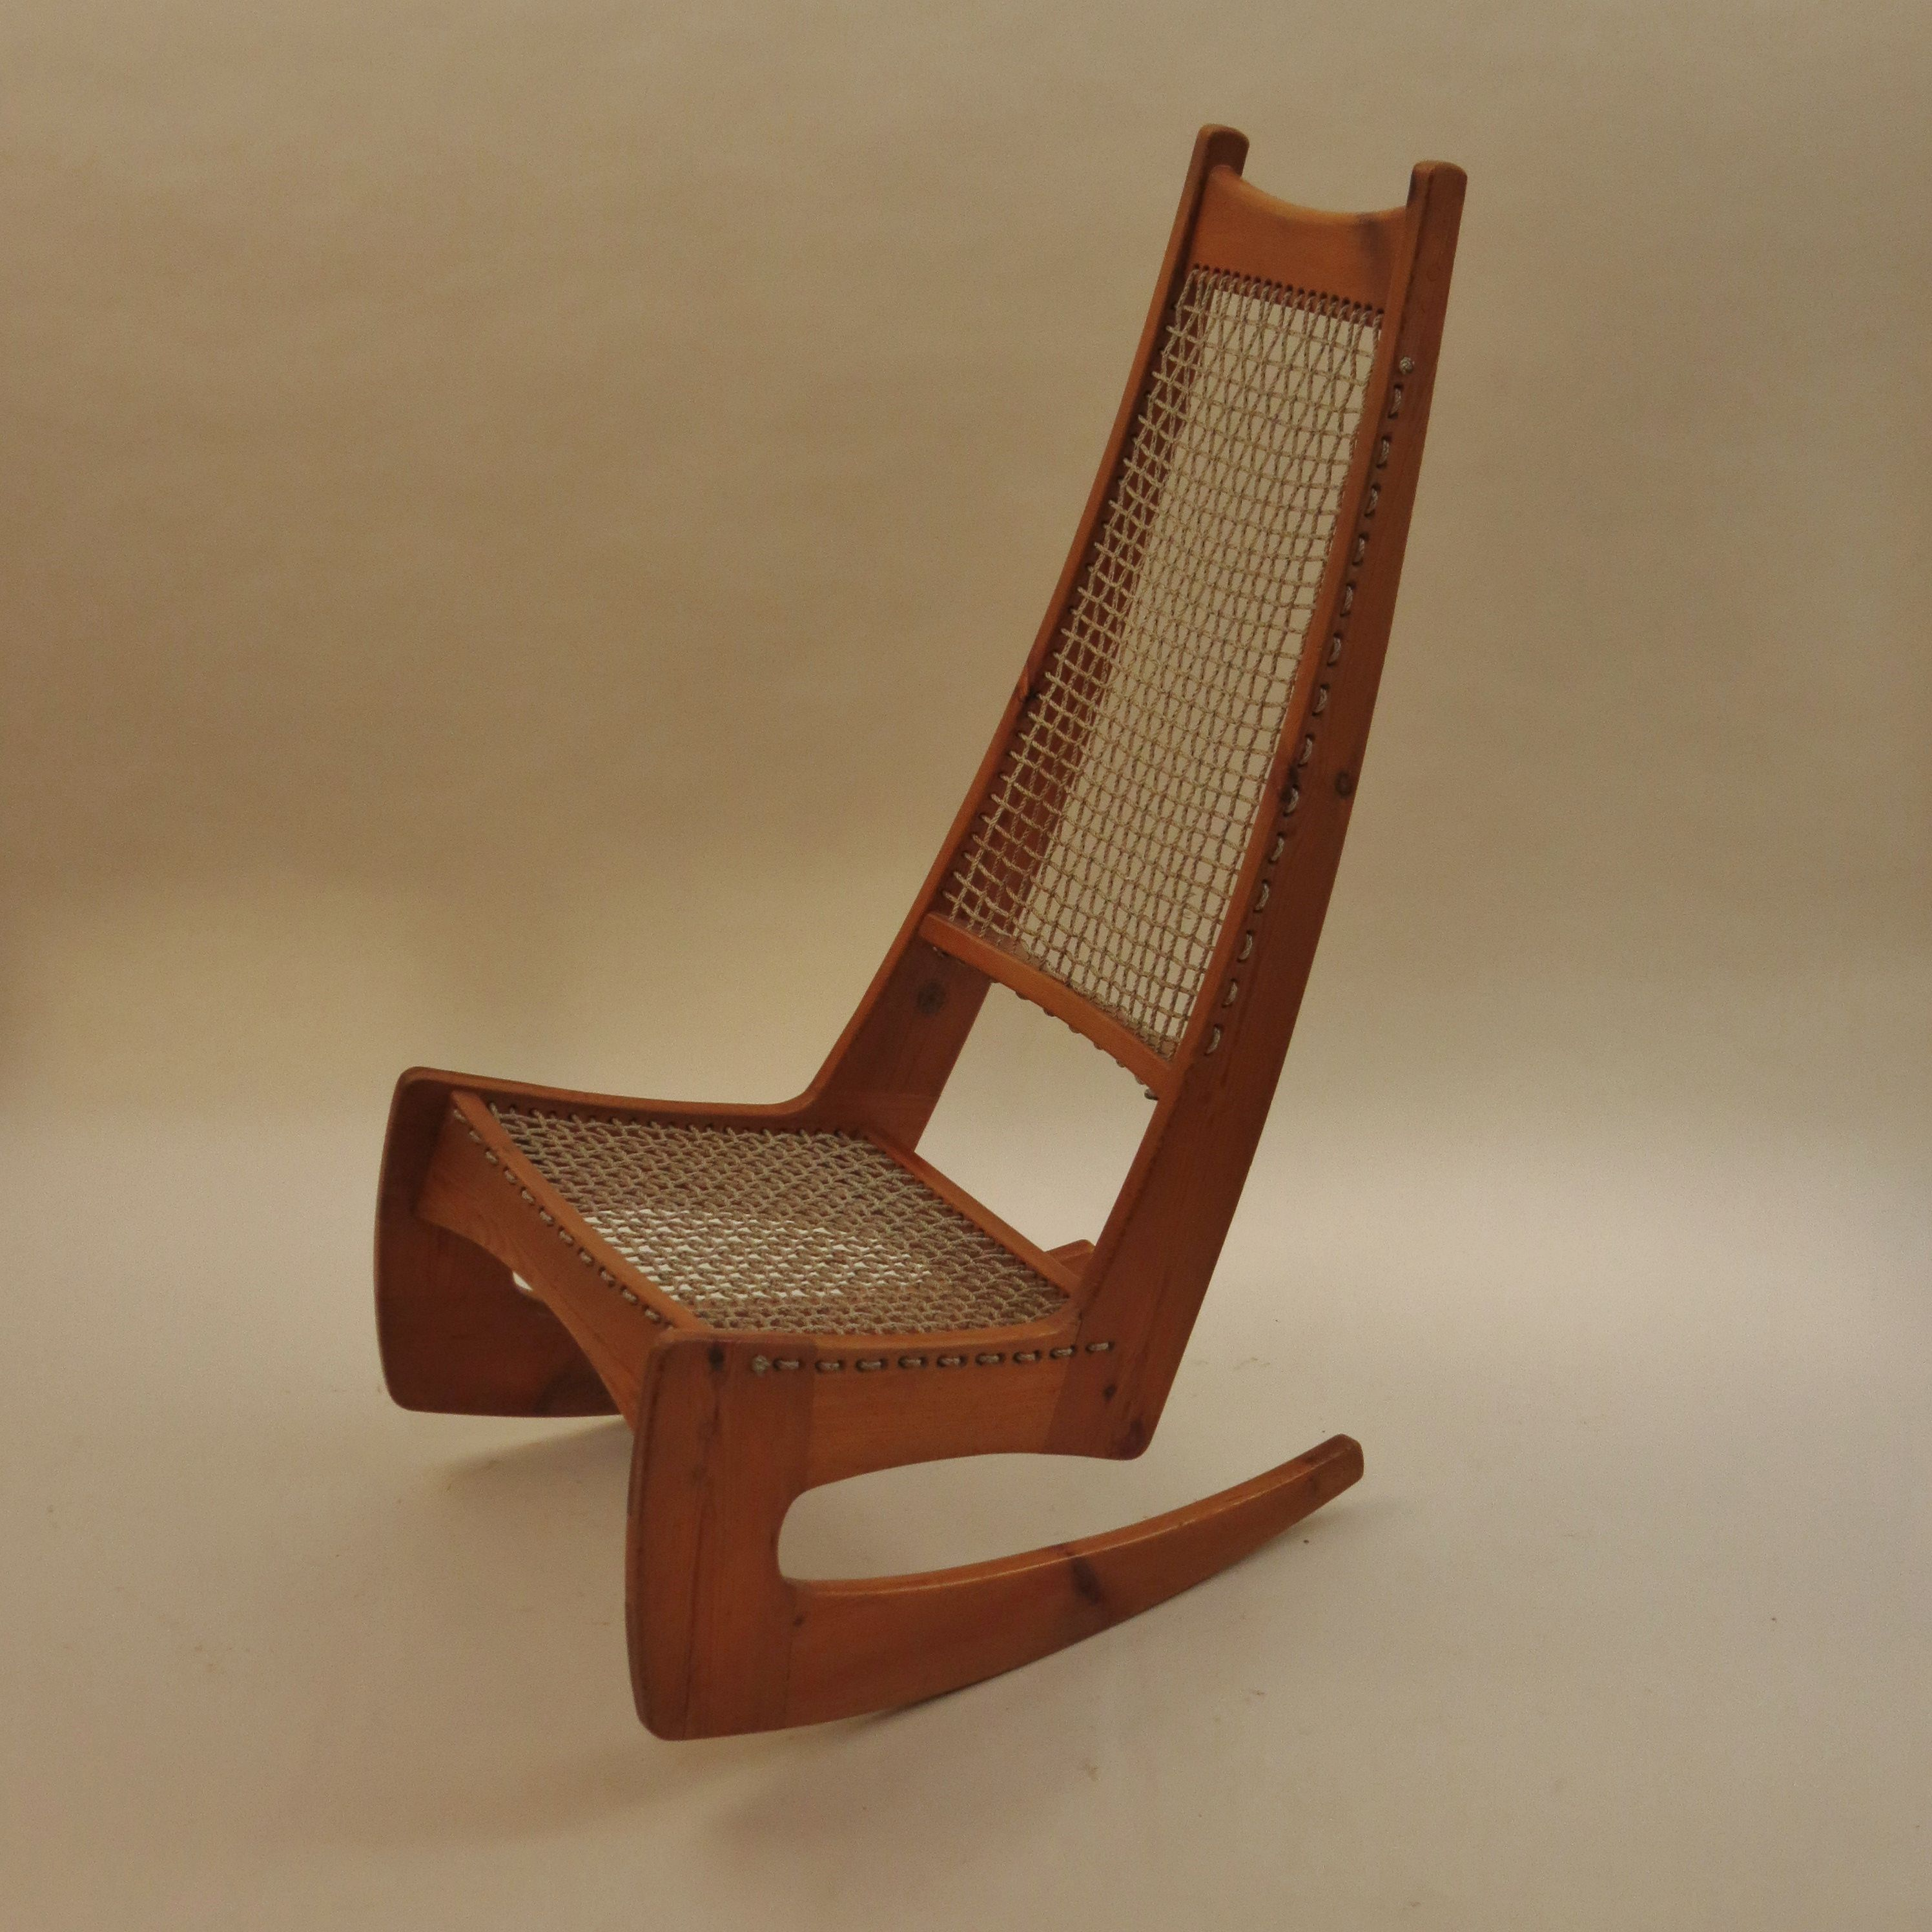 http://www.decorativemodern.co.uk/decorativemodern/jeremy-broun-high-back-rocking-chair/